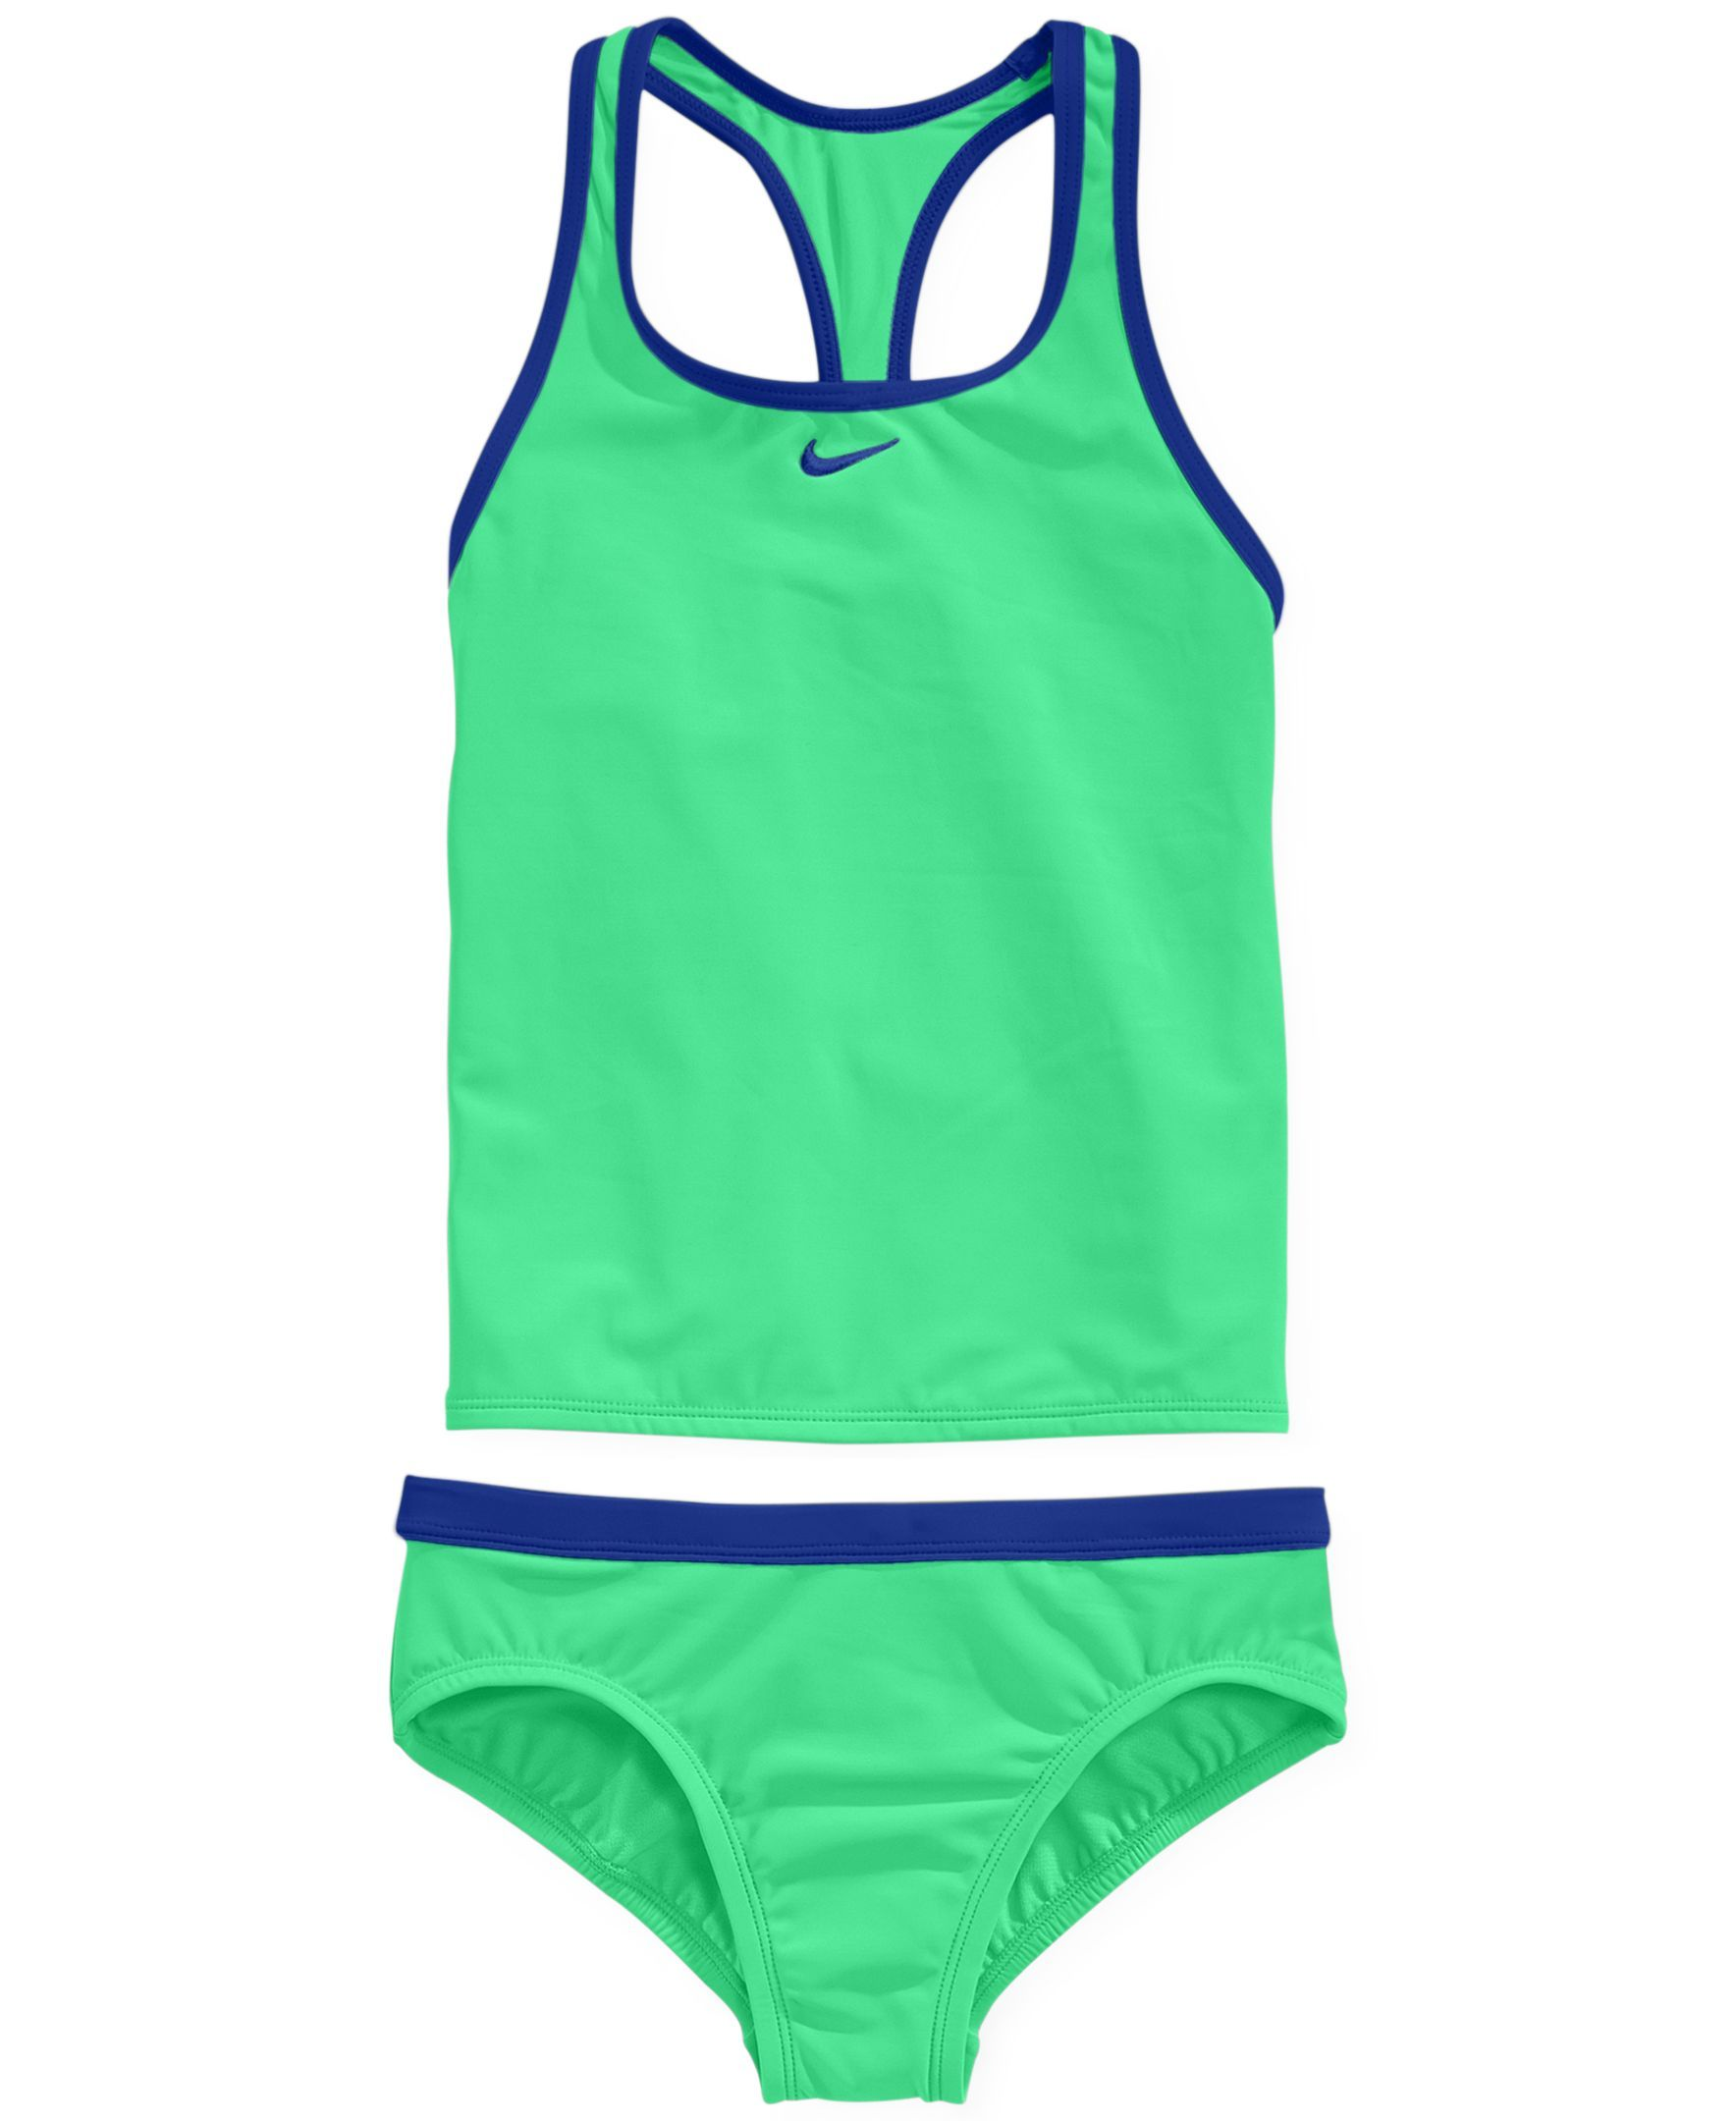 1ca9ca08d1 Nike Girls' 2-Piece Racerback Tankini Swimsuit | Swimsuits in 2019 ...